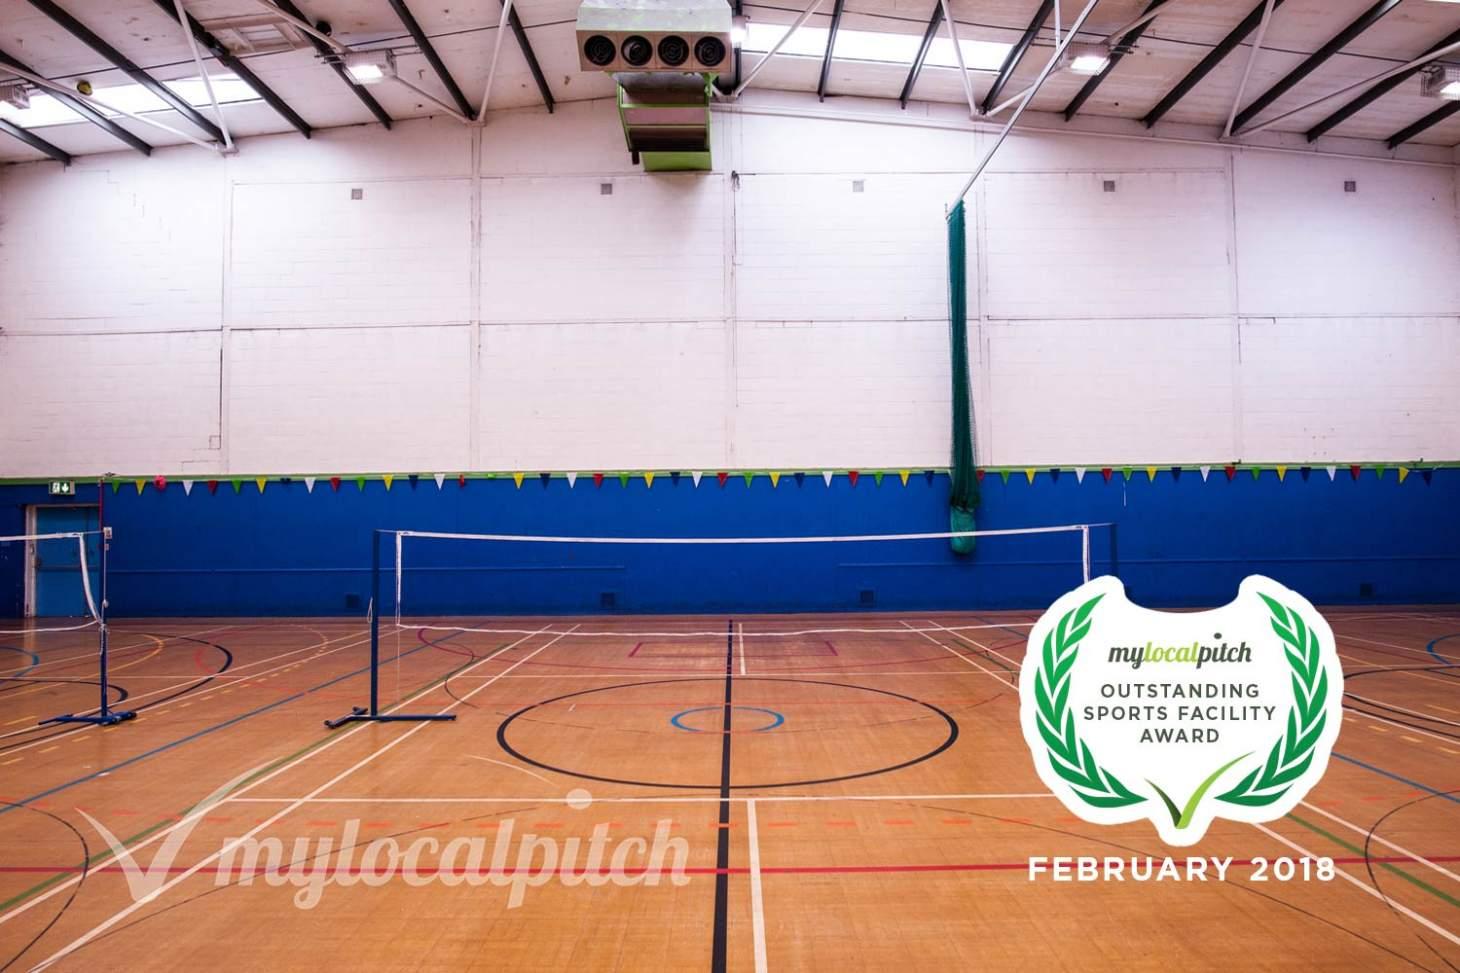 Ordsall Leisure Centre Indoor | Hard badminton court